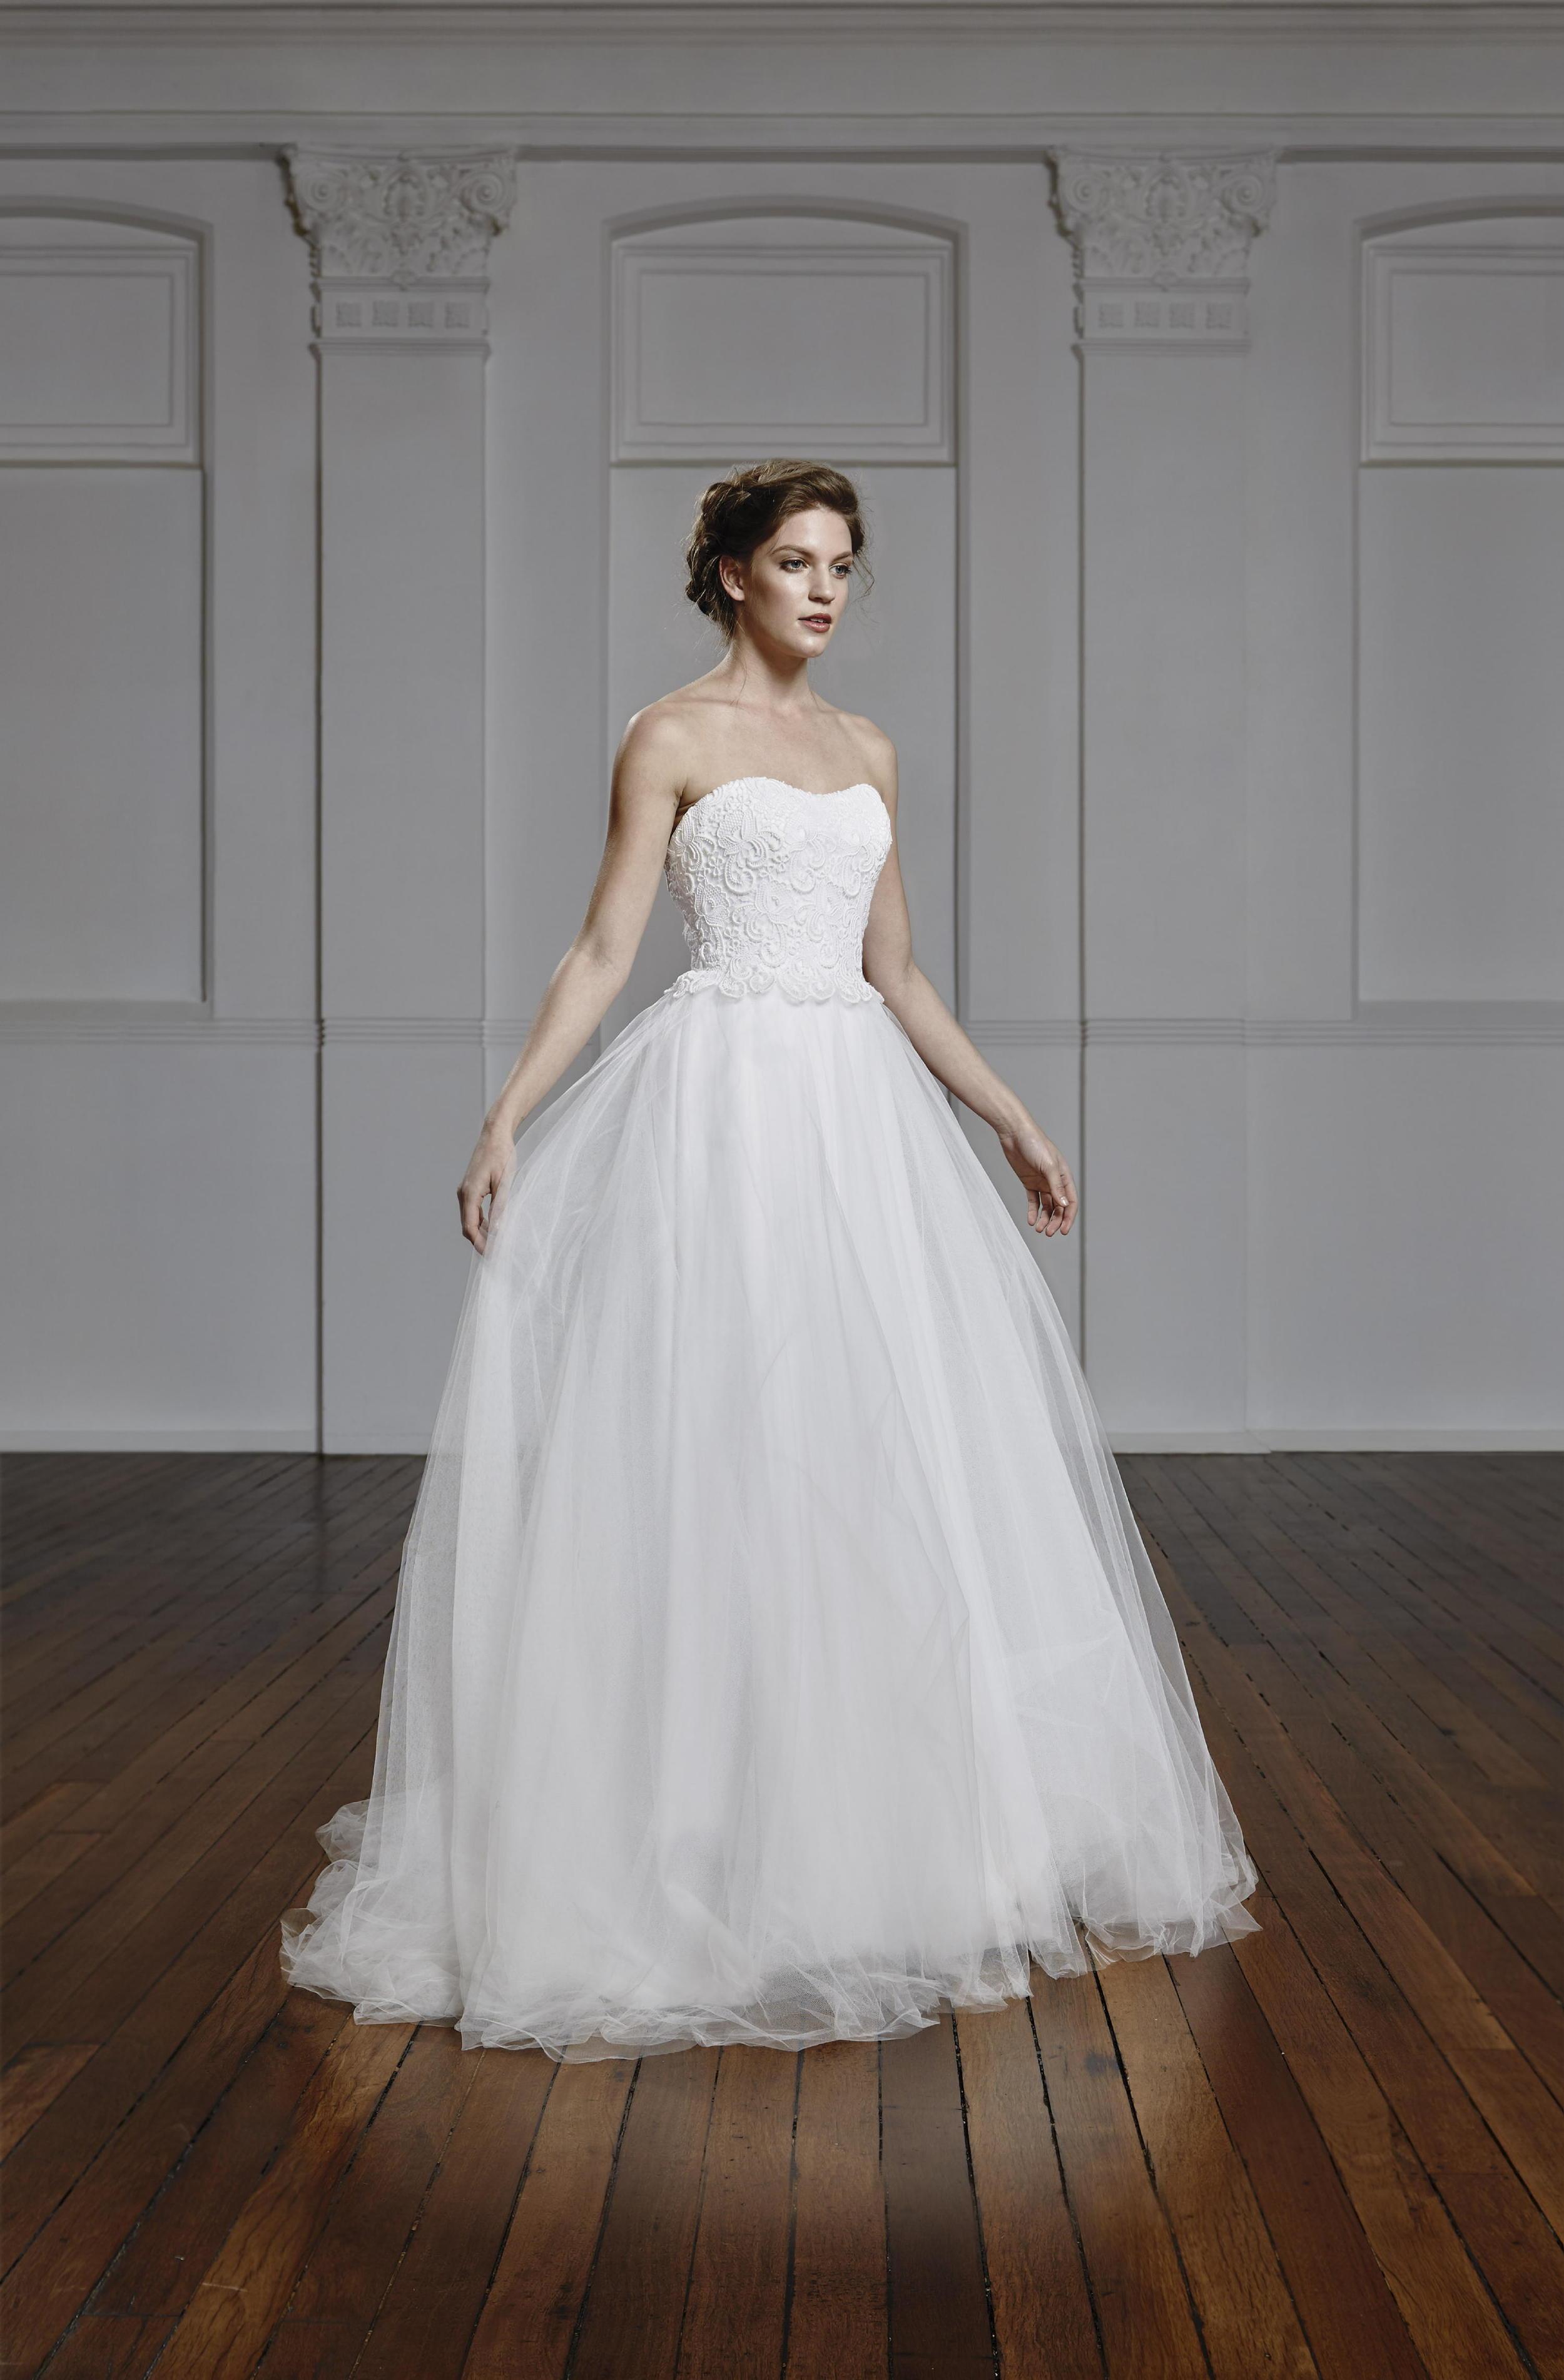 Rose-bridal design_TanyaAnic_©GrantSparkesCarroll_185a.jpg